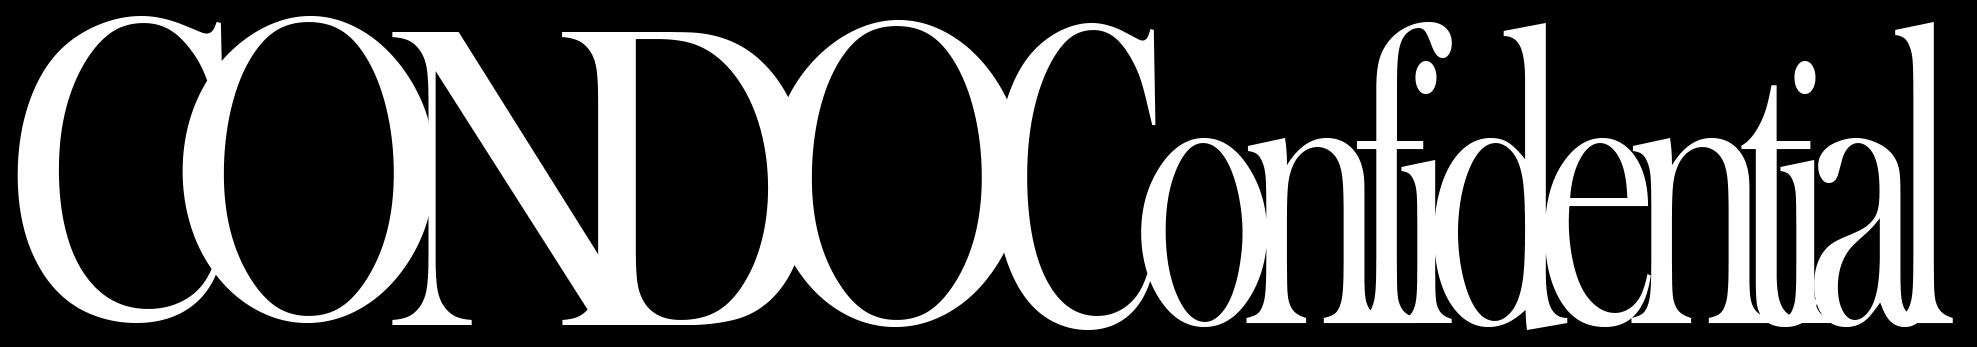 CC-logo-full.png